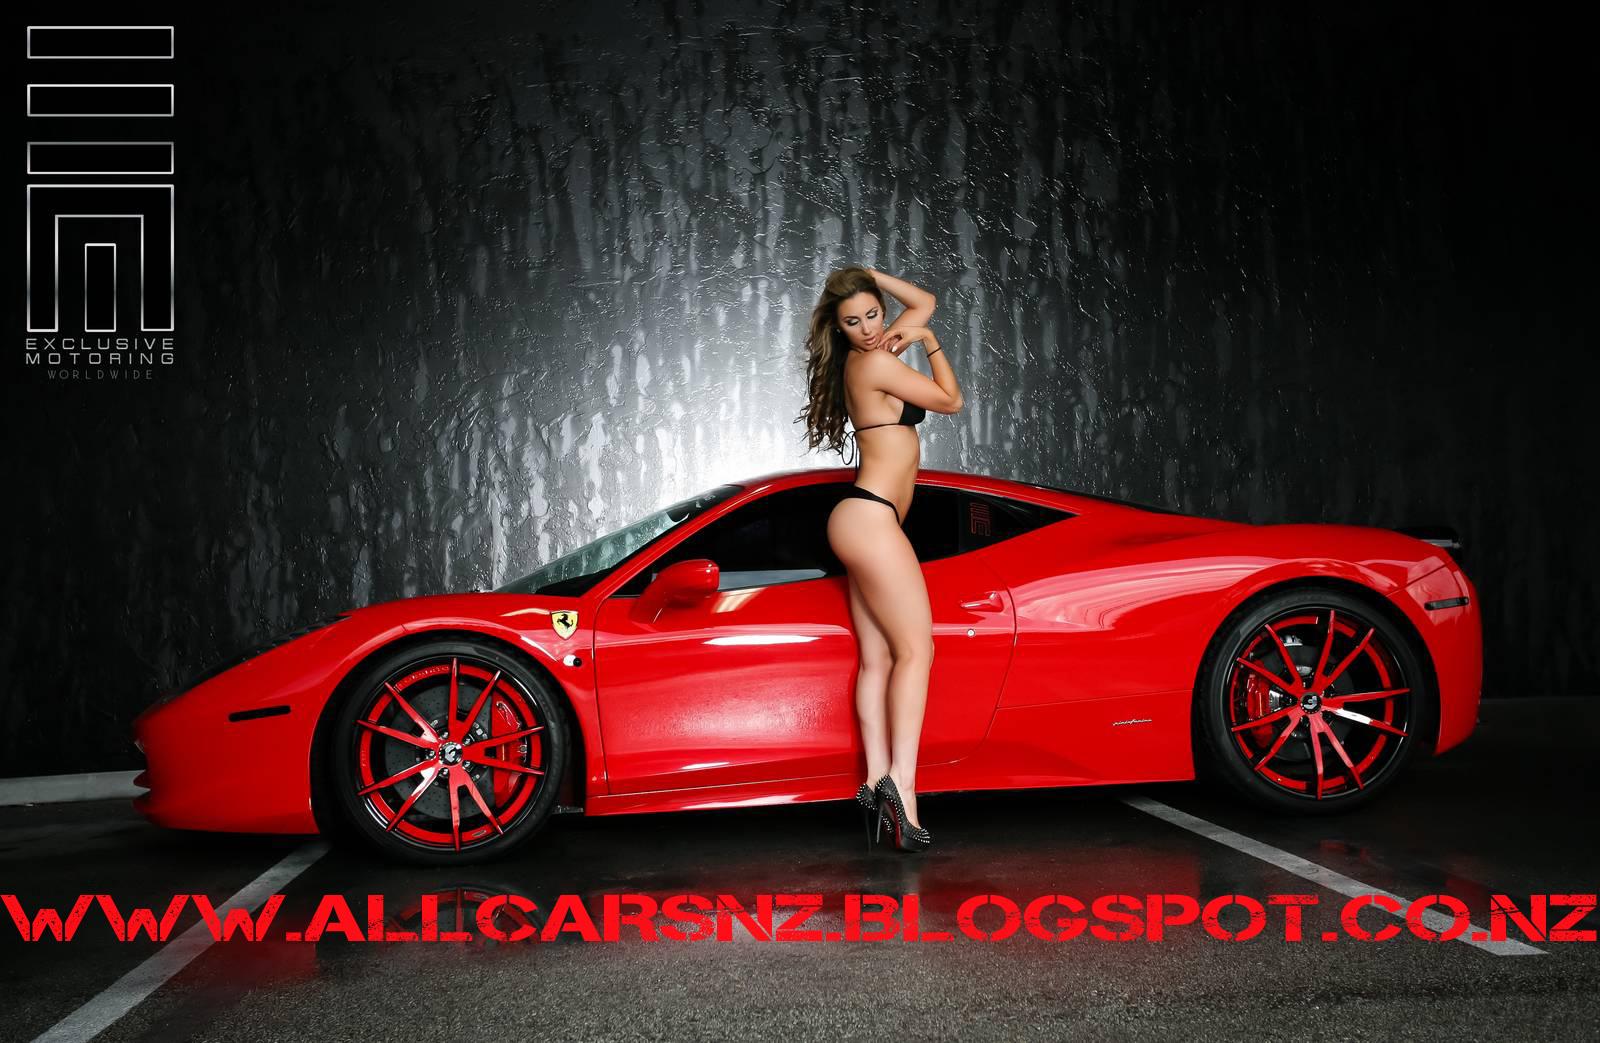 Diecast Model Cars For Sale Melbourne